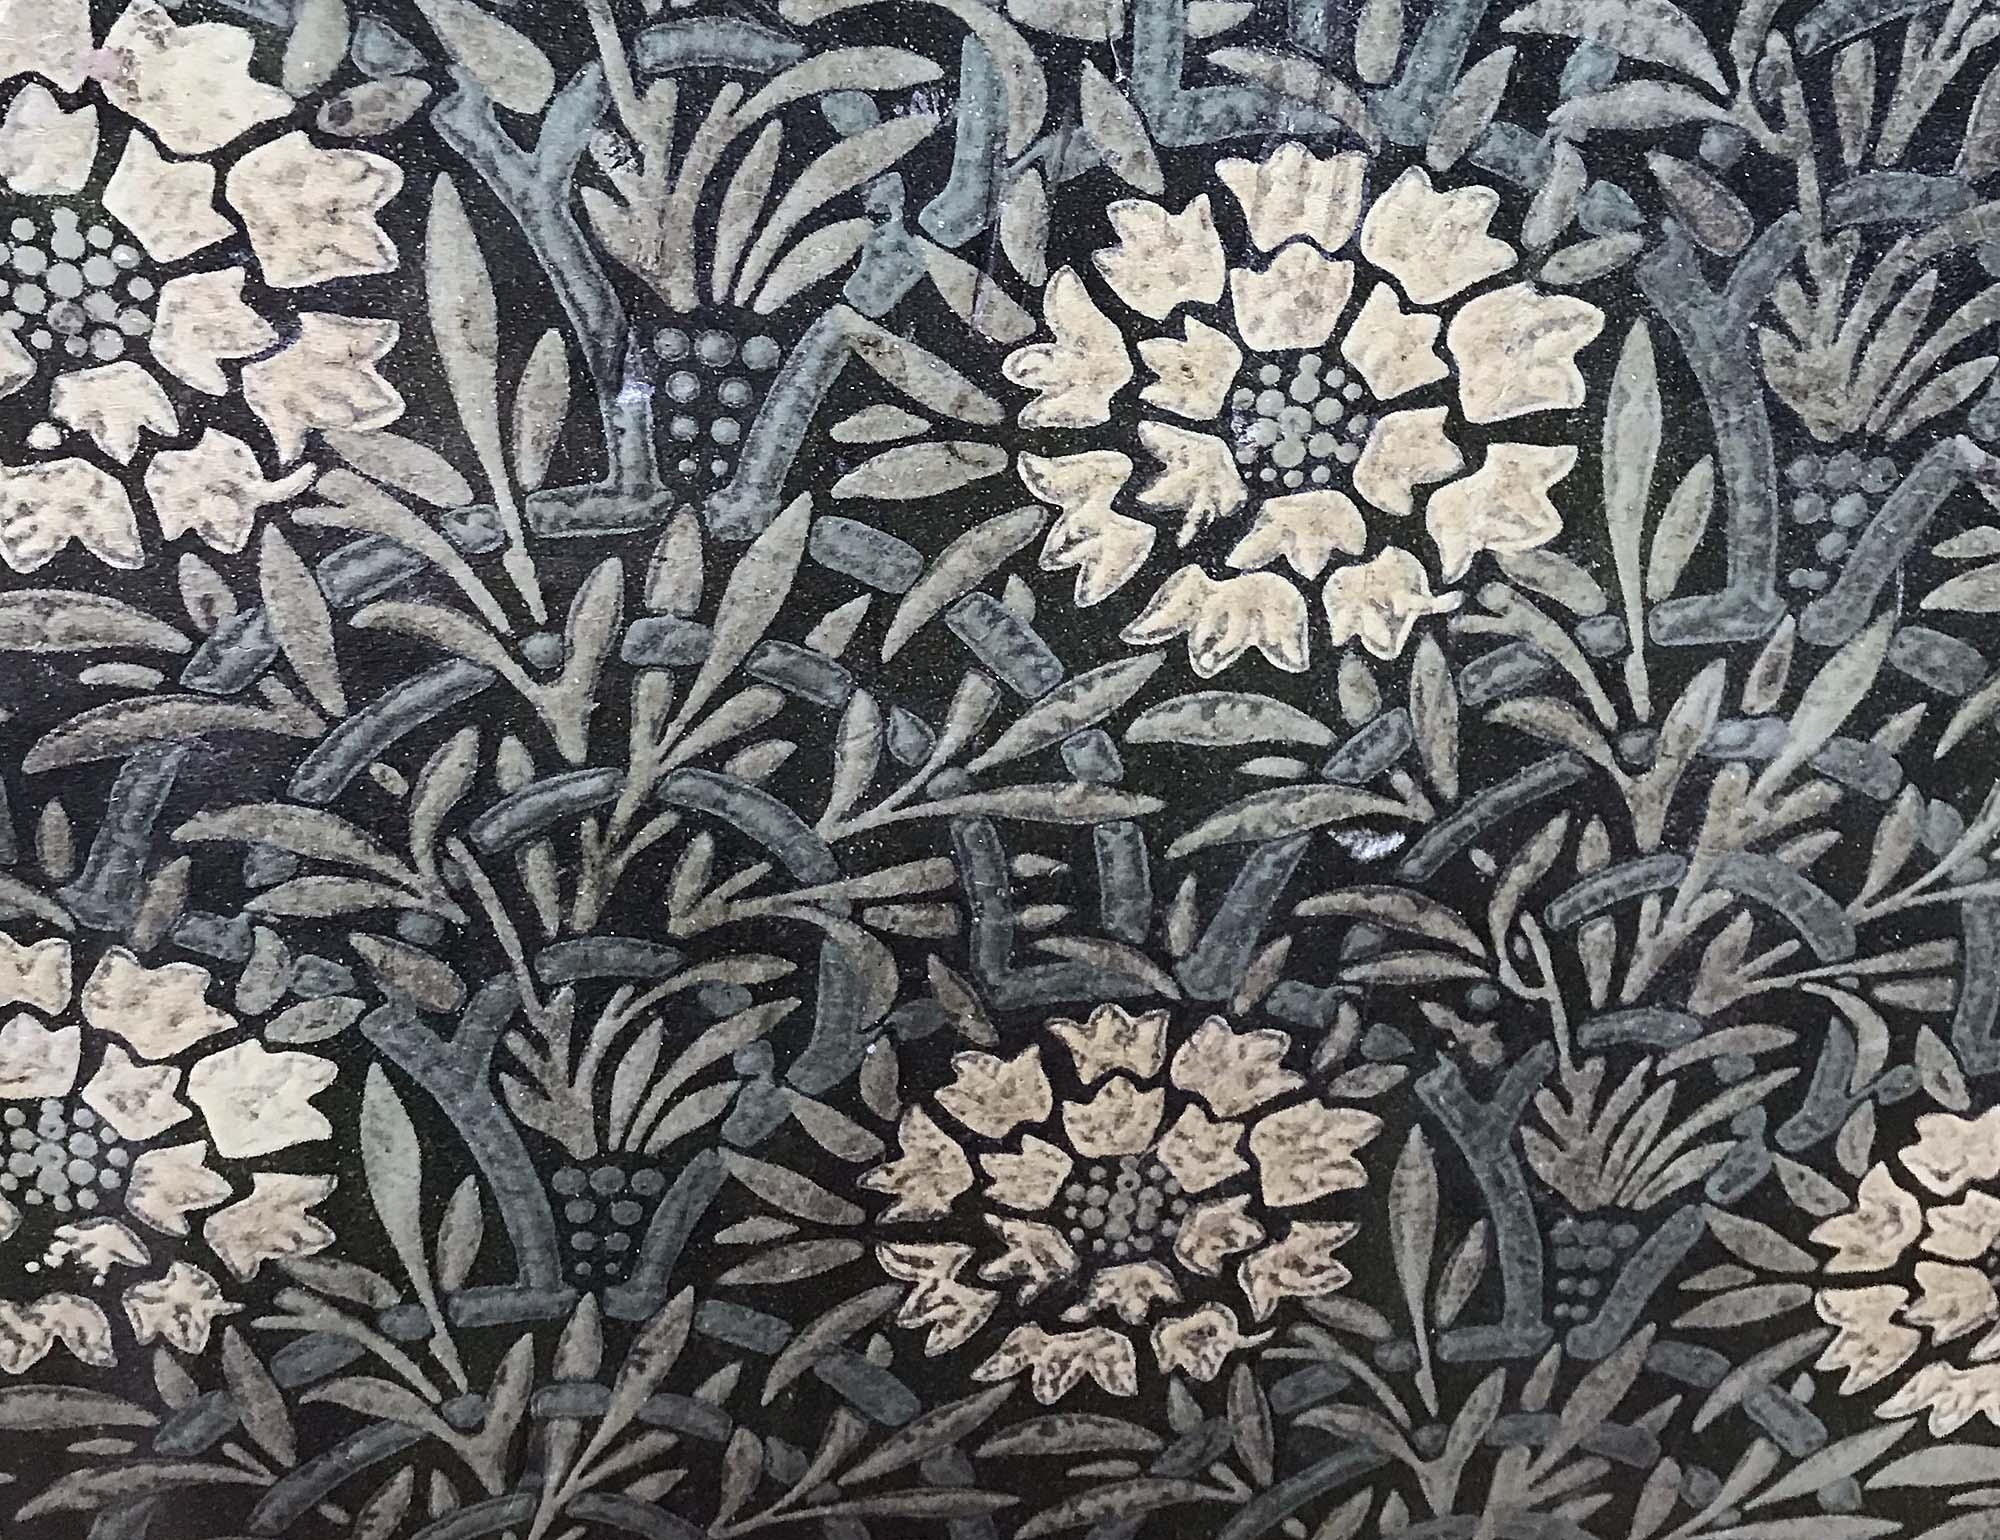 a photo of flower patterned linoleum